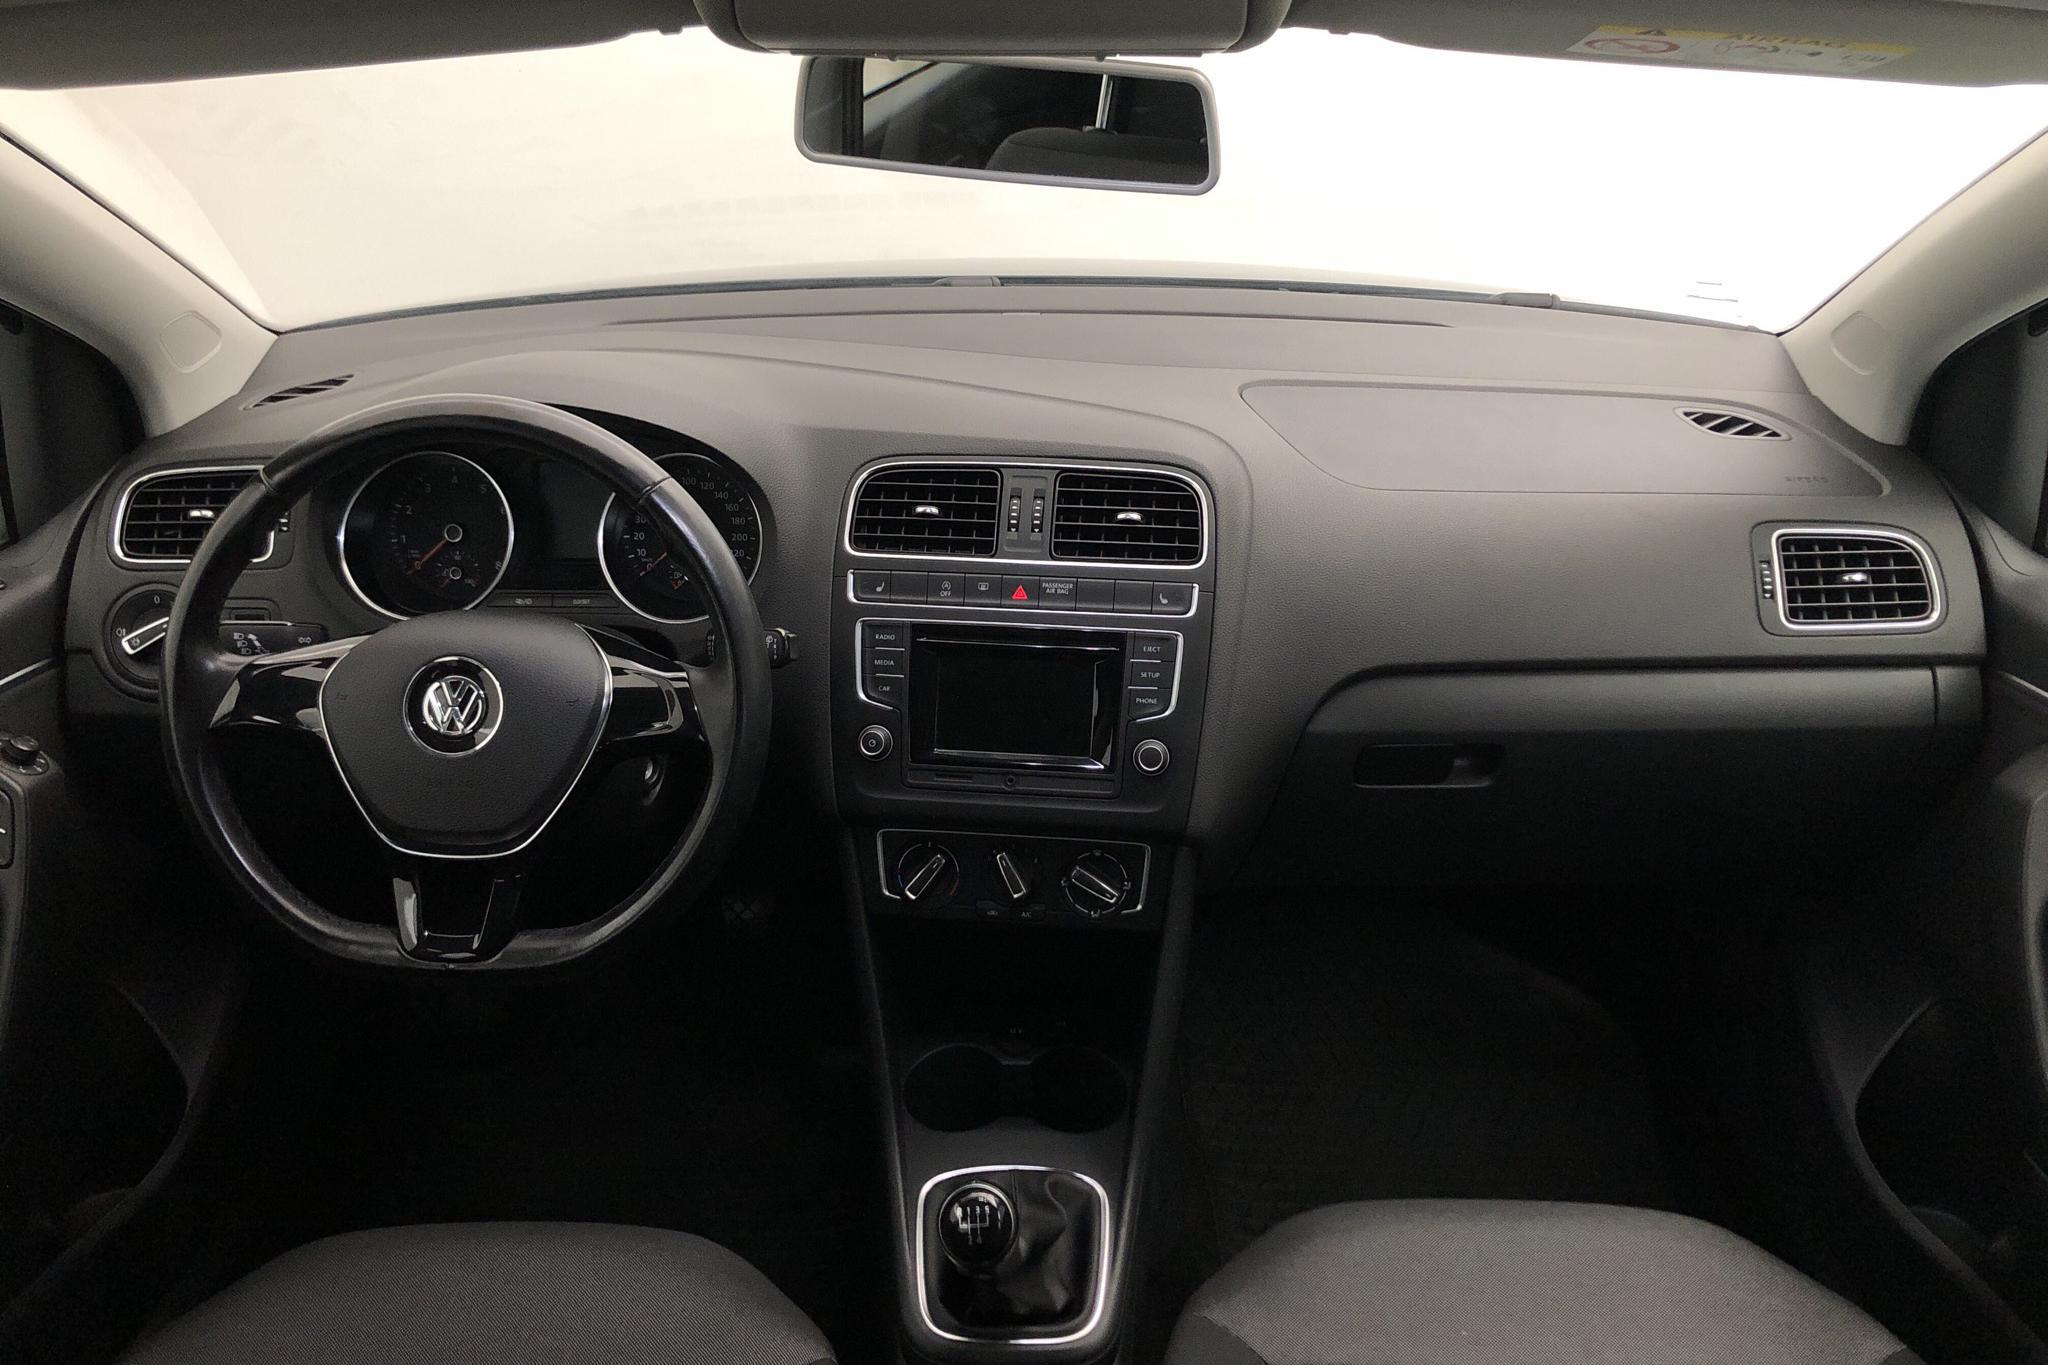 VW Polo 1.2 TSI 5dr (90hk) - 6 108 mil - Manuell - svart - 2016